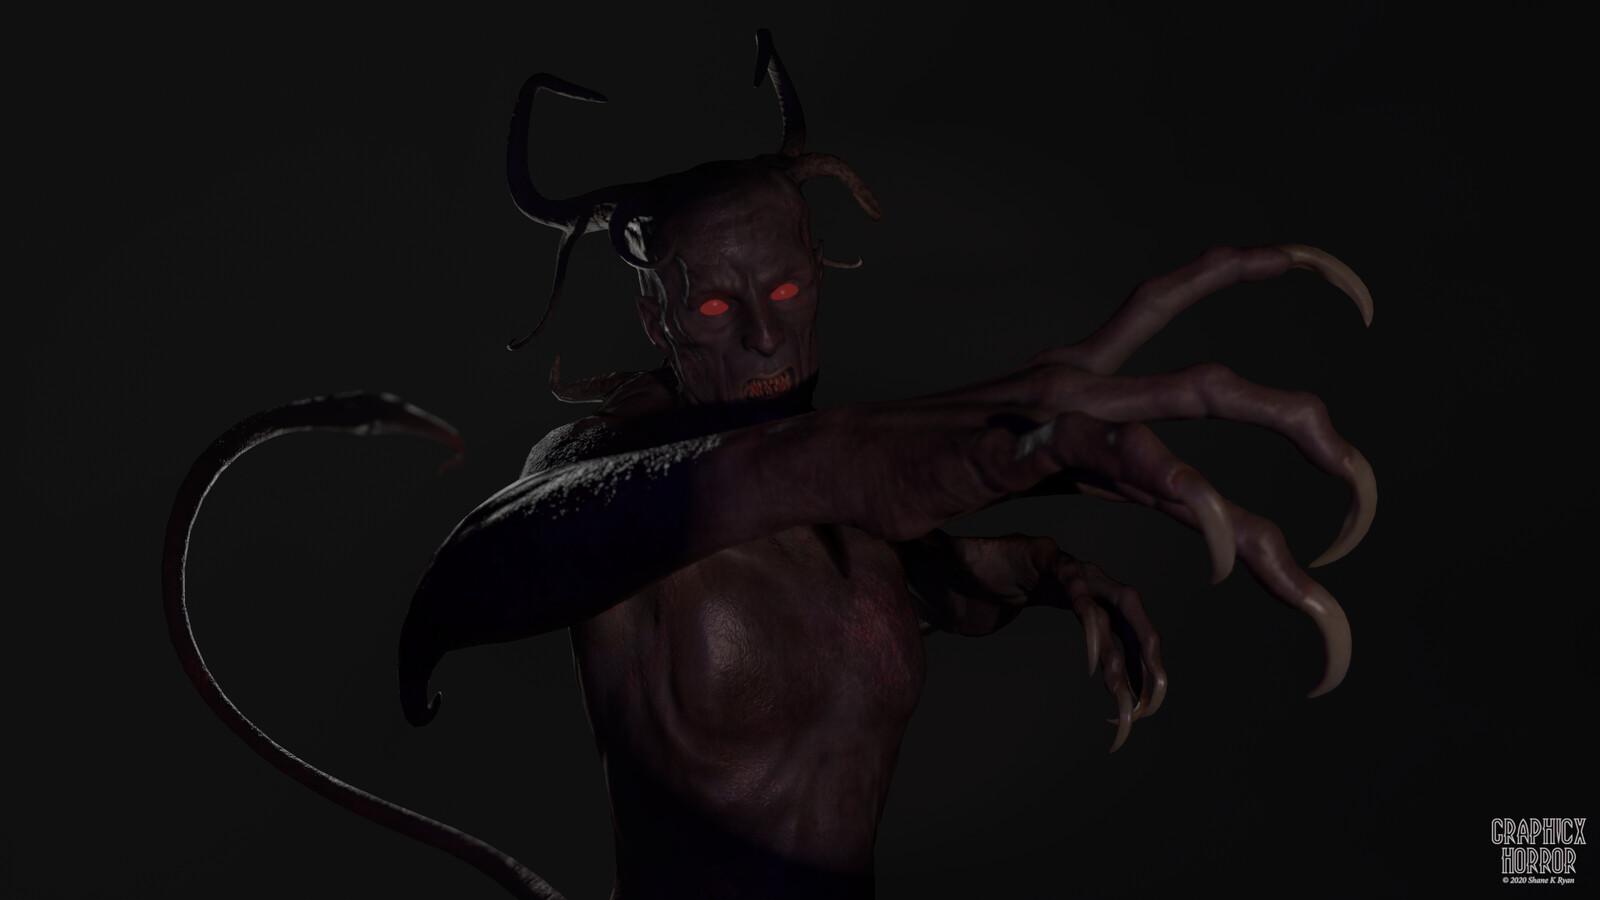 The Devil.